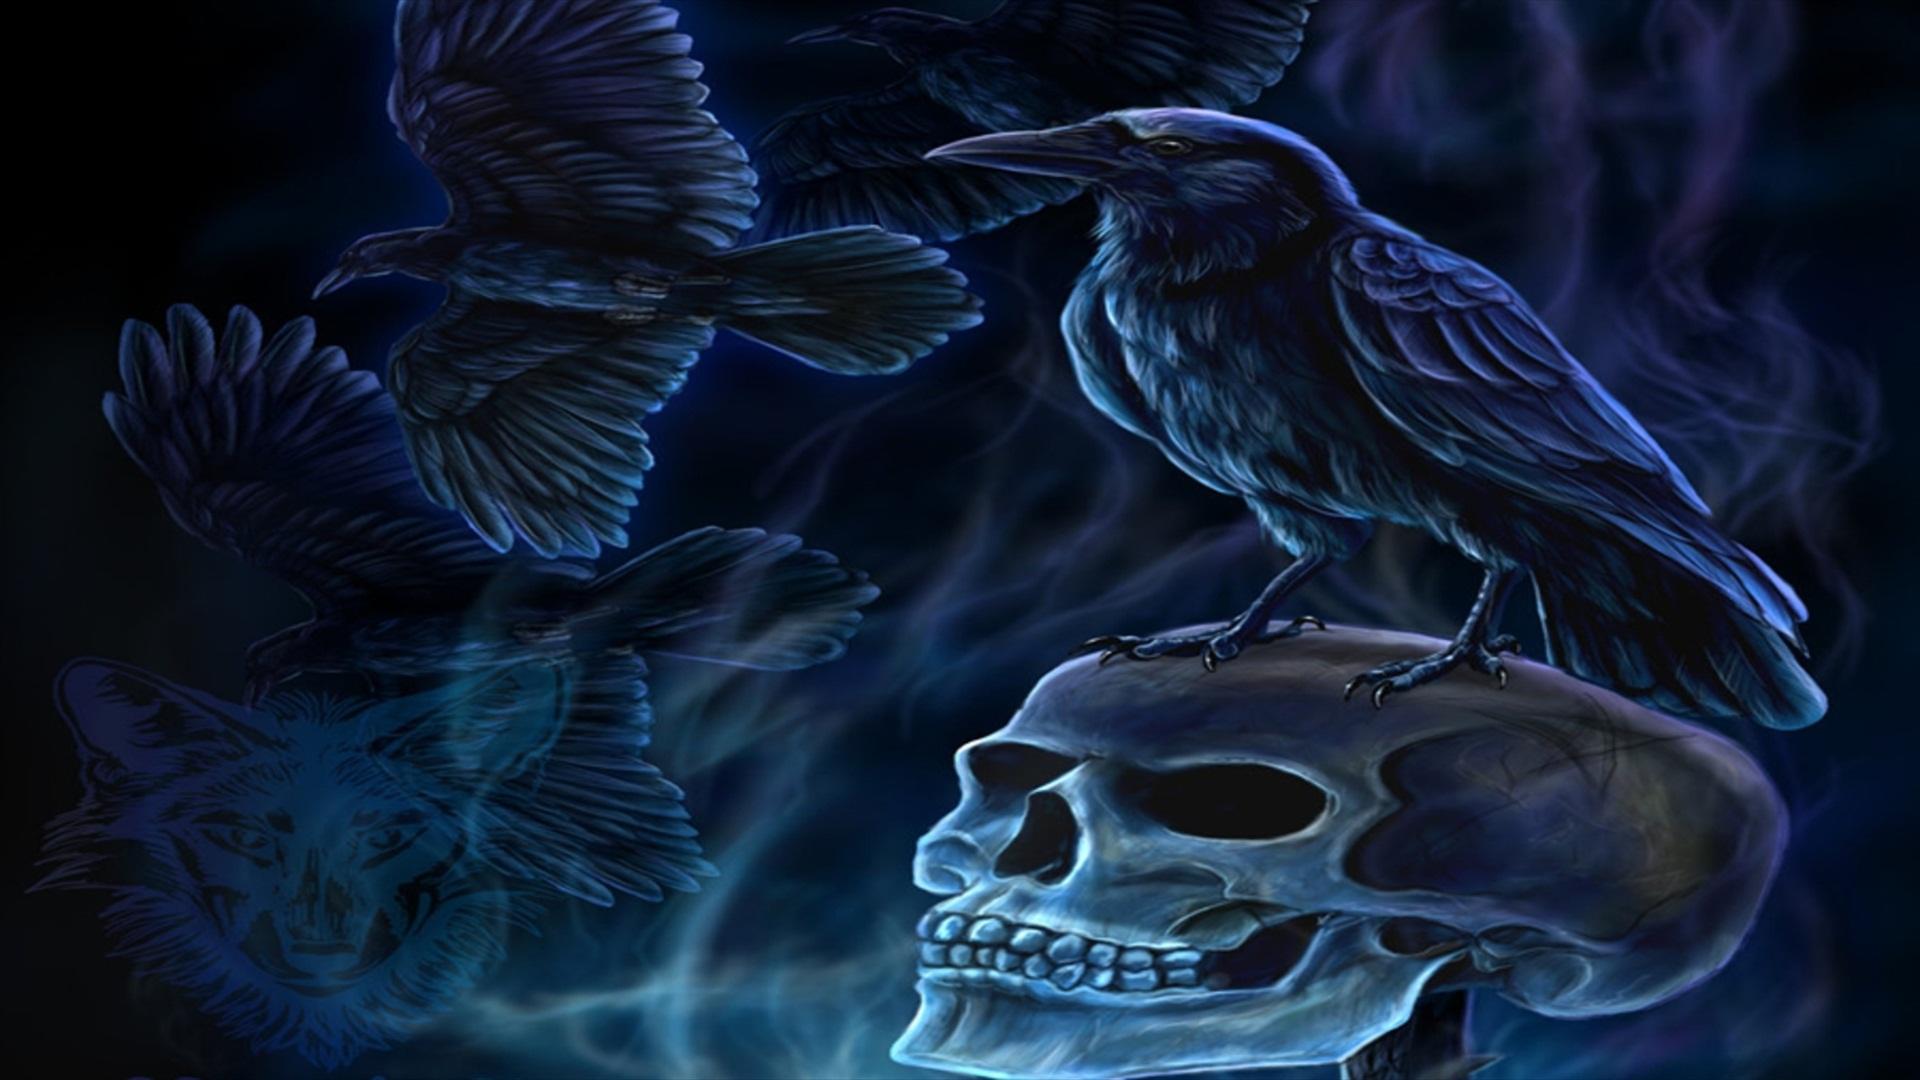 Dark Gothic Wallpaper Gothic Wallpapers Wallpaper